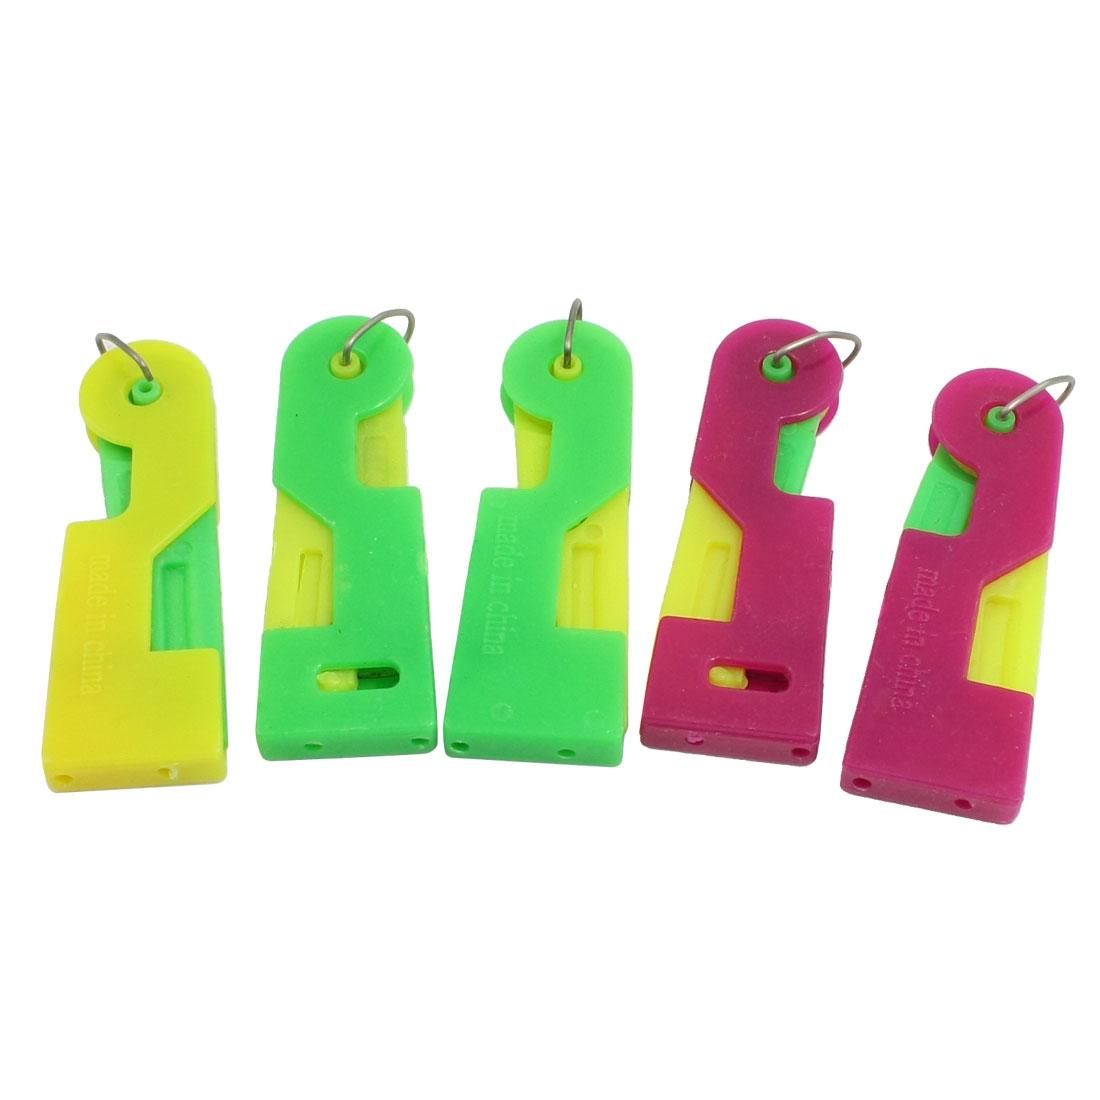 5 Pcs Elder Sewing Helper Plastic Needle Threading Inserters